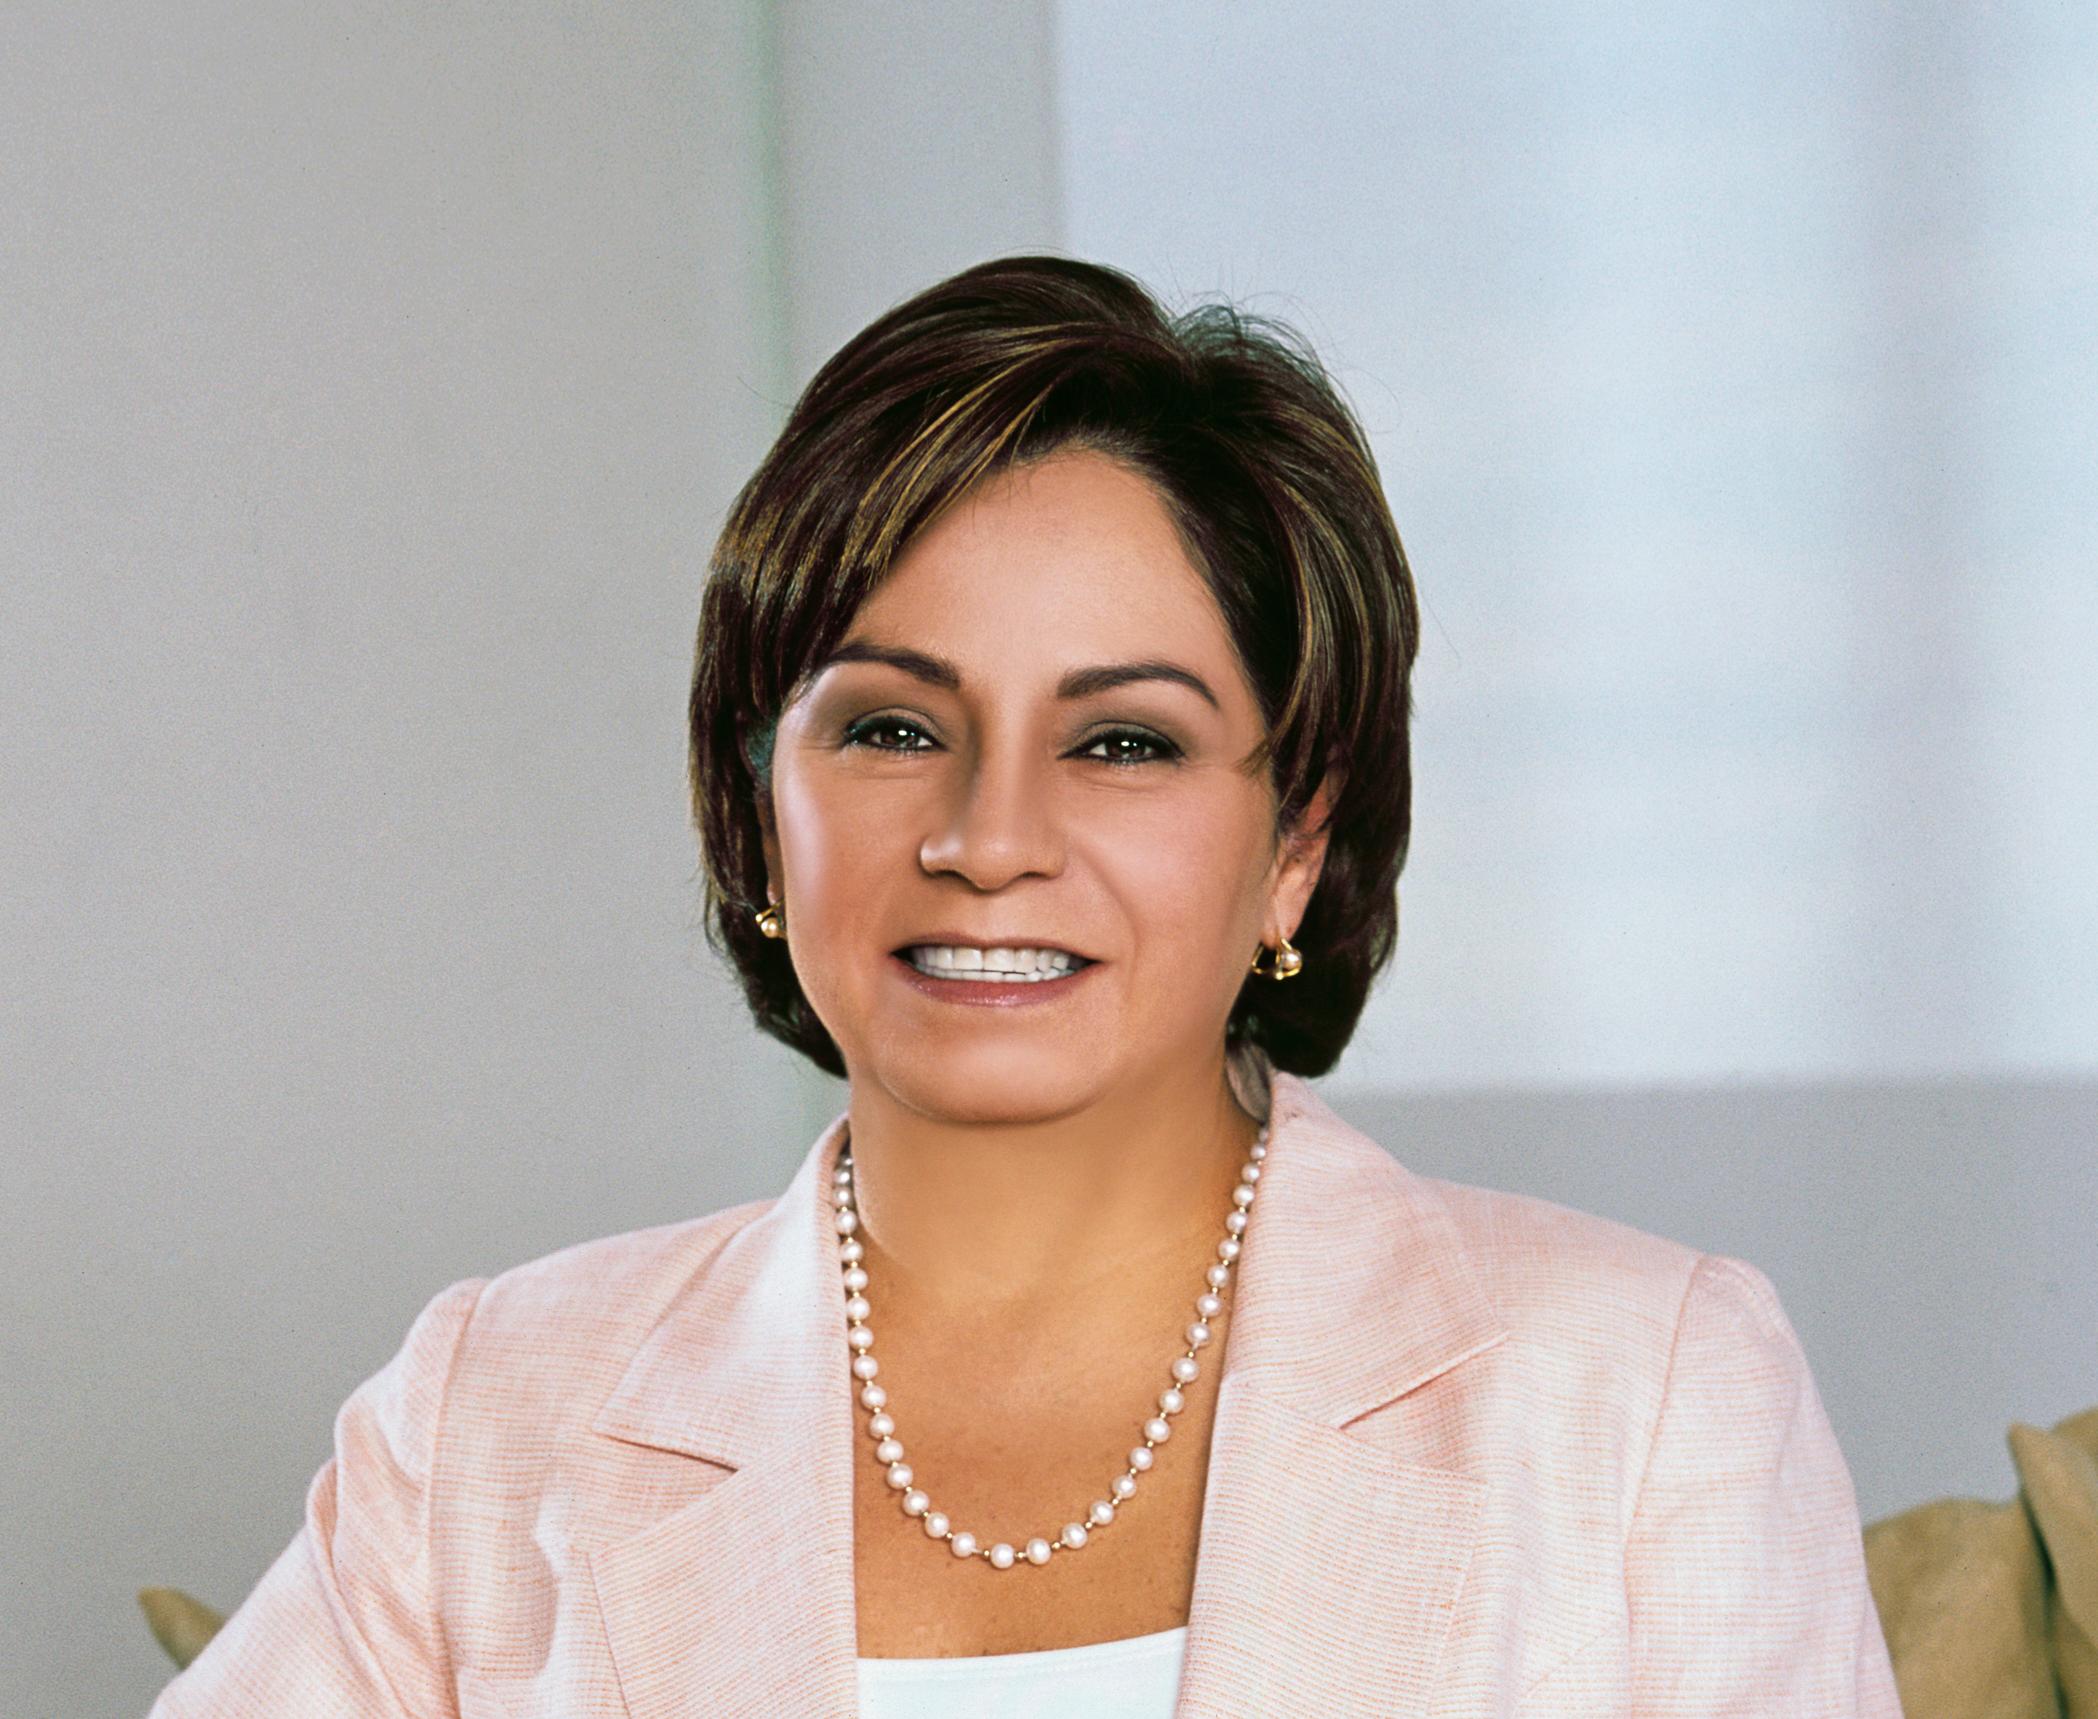 Photo of Patricia Espinosa